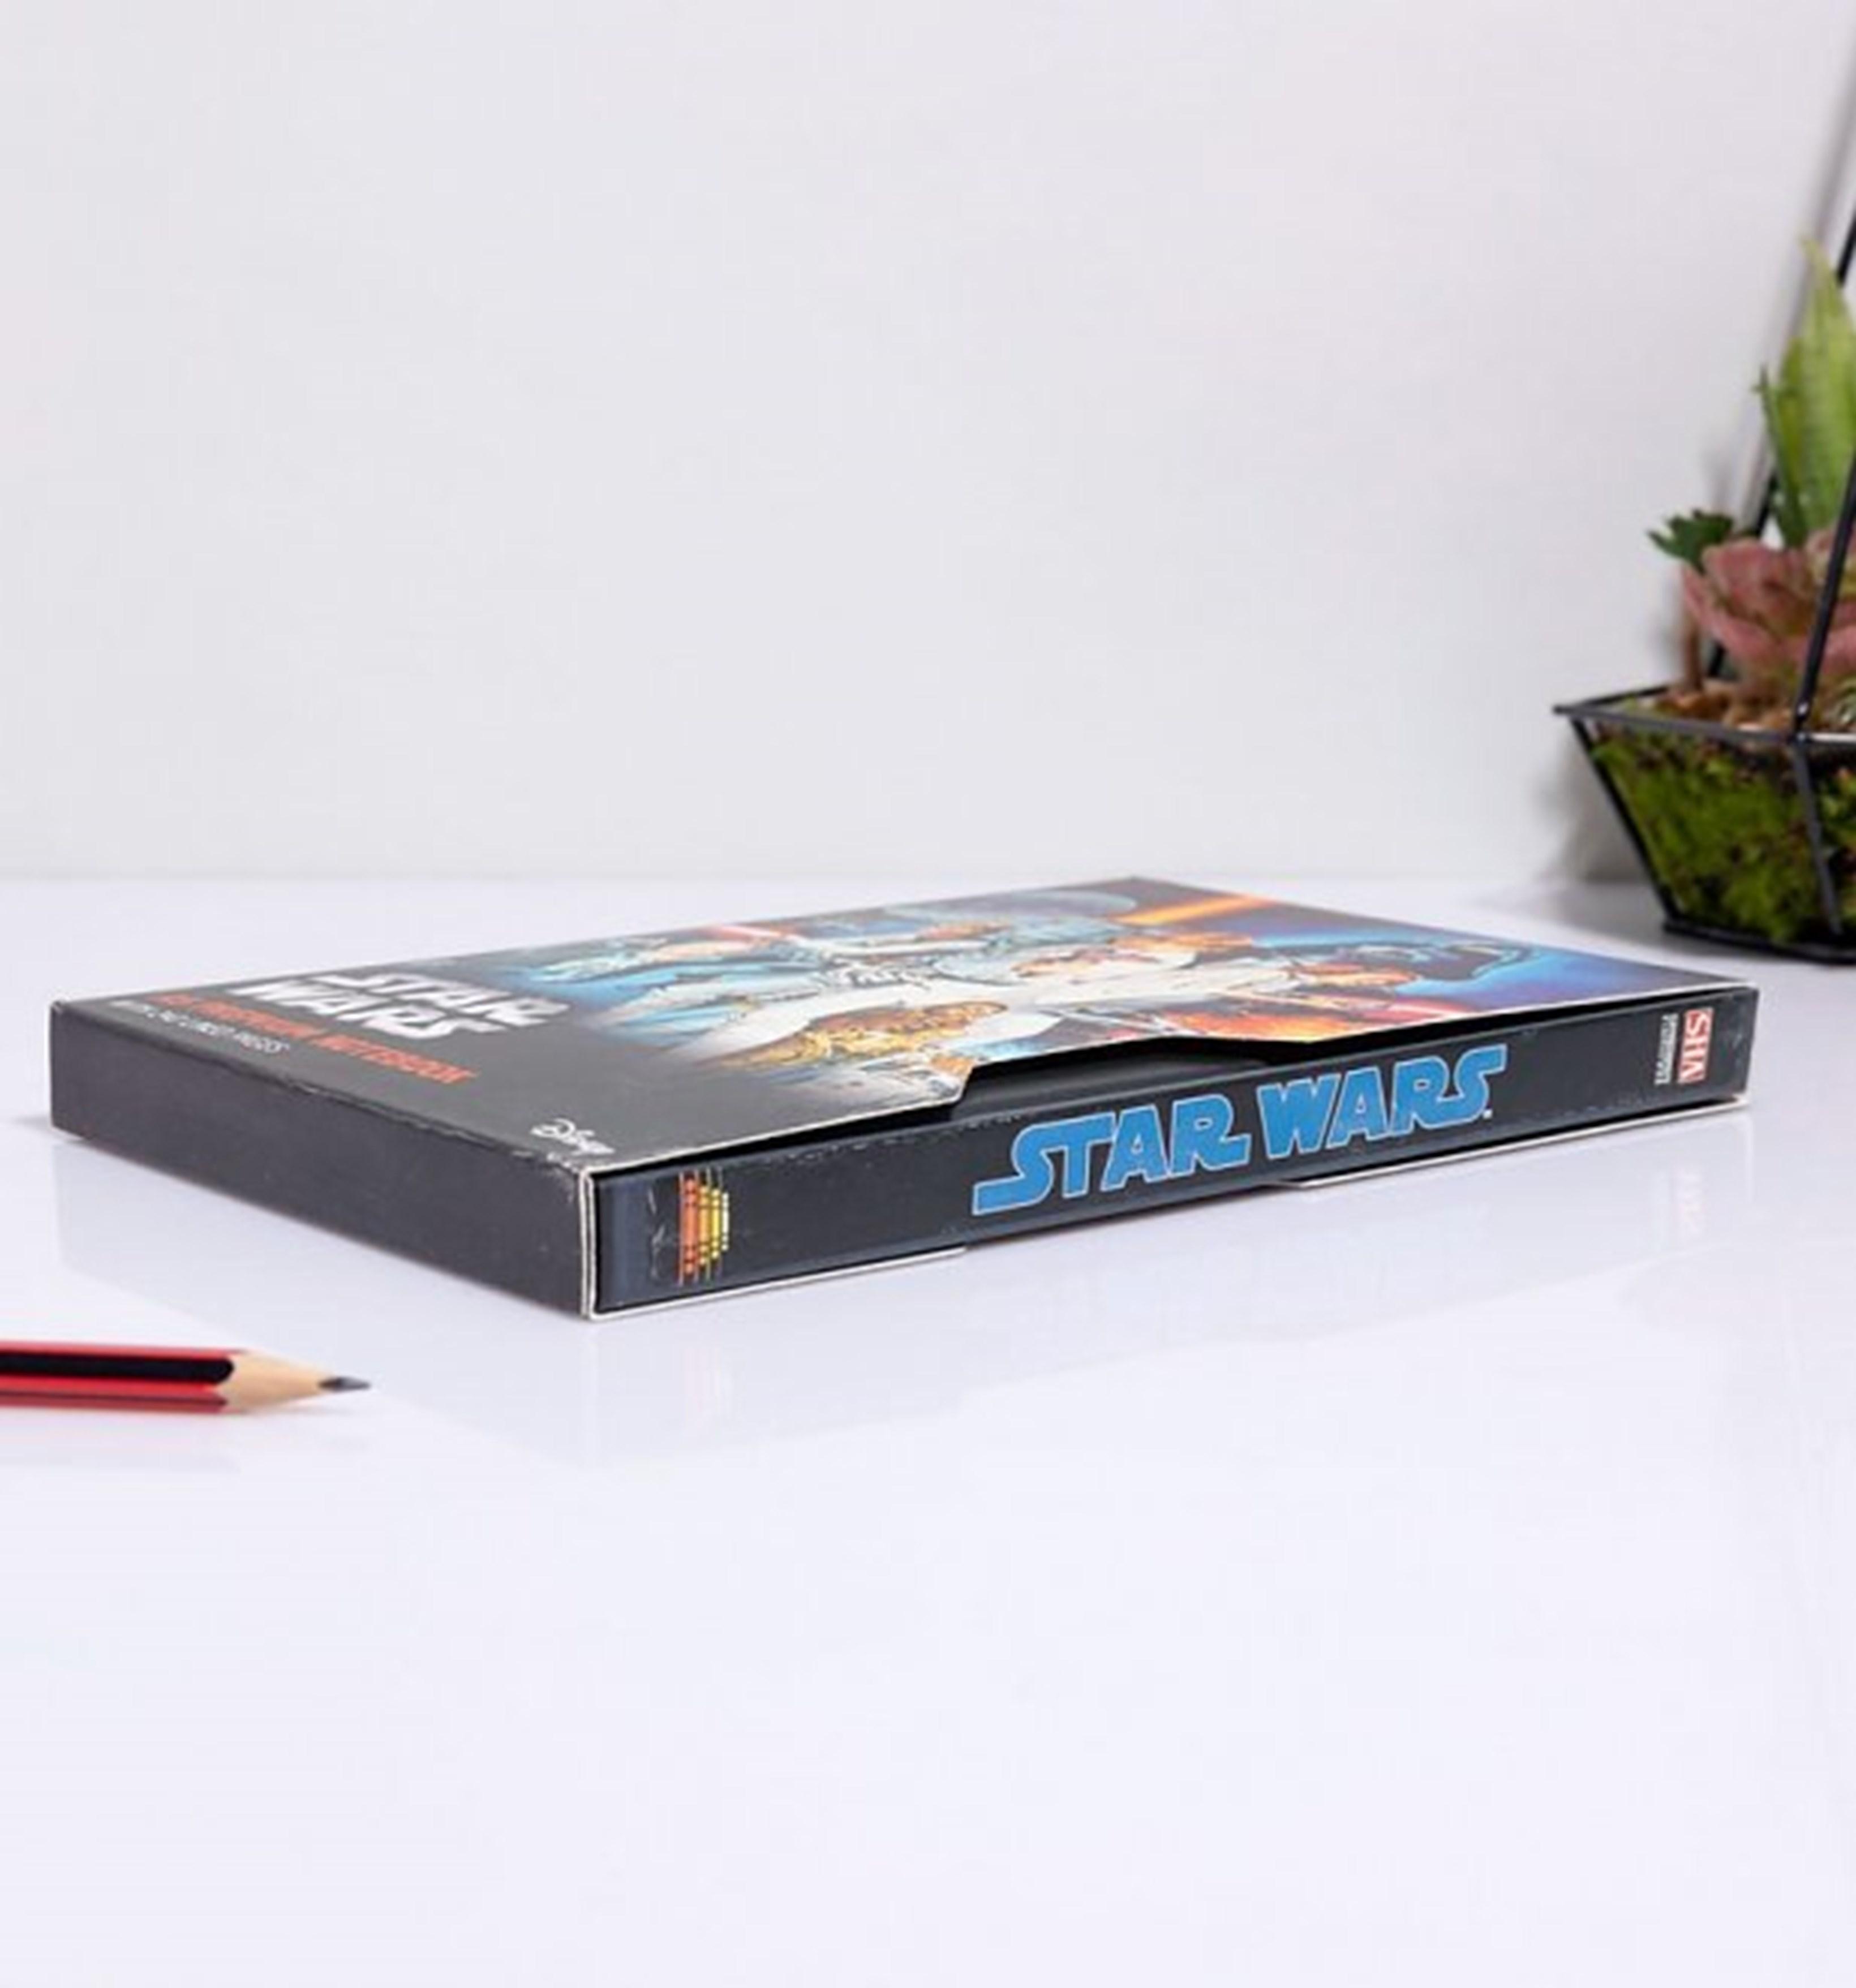 Star Wars (A New Hope) VHS Premium A5 Notebook - 2